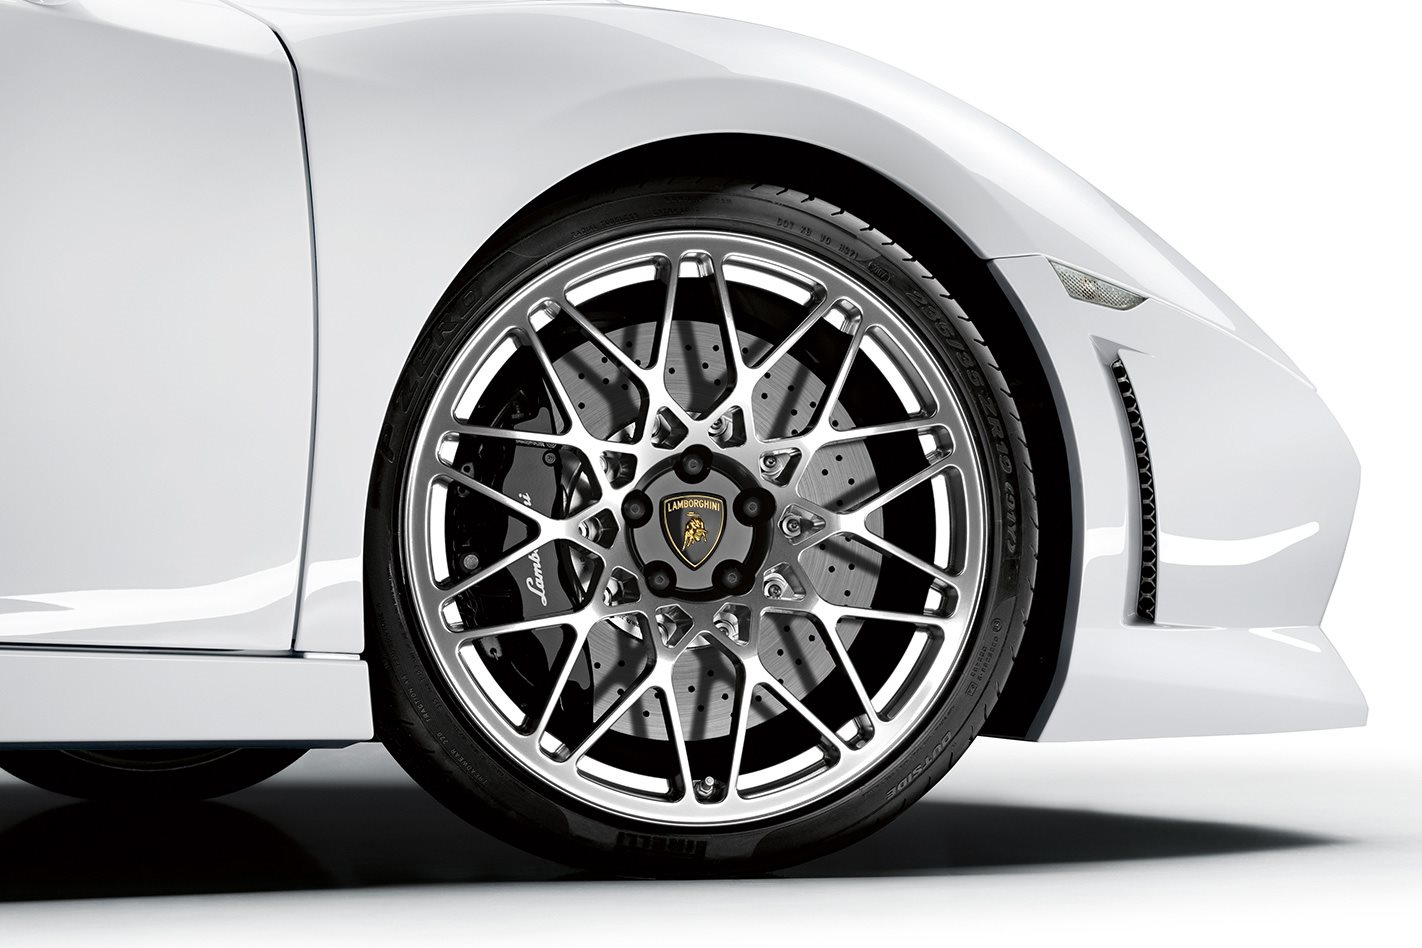 Lamborghini Gallardo Spyder wheels